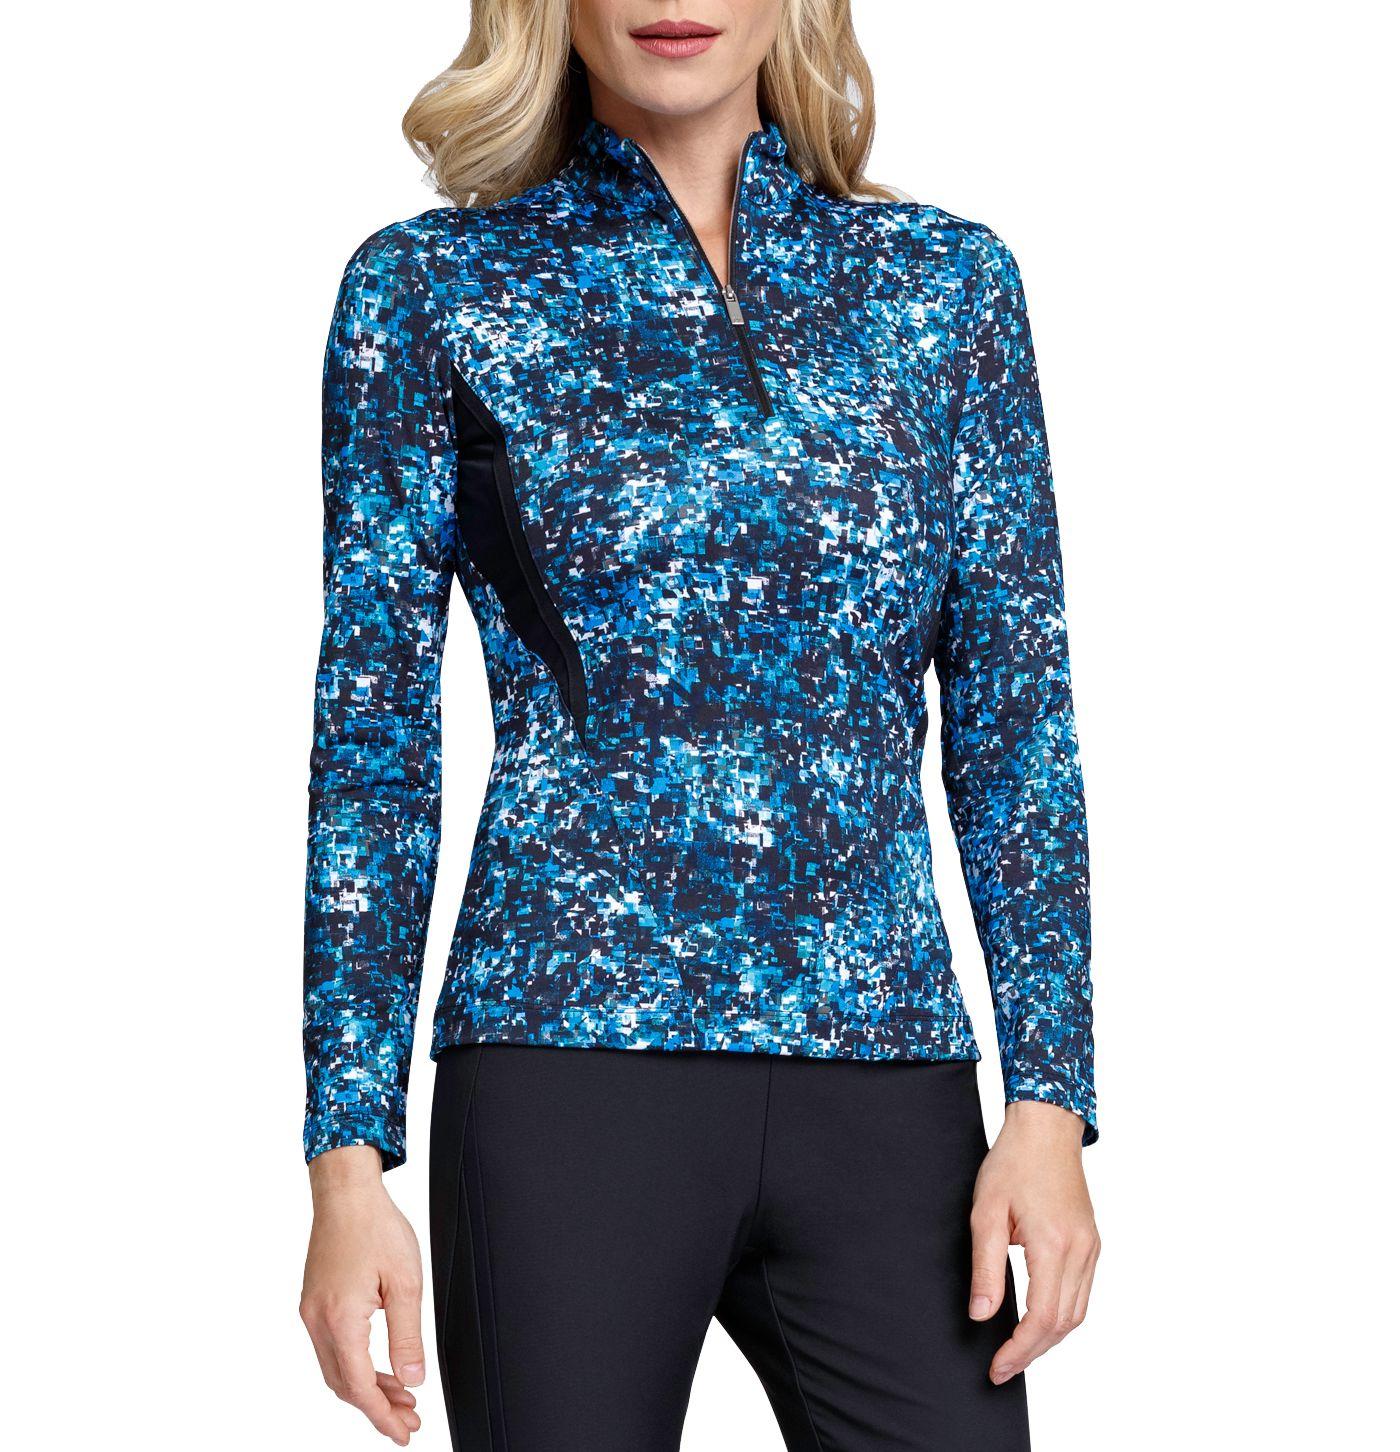 Tail Women's Long Sleeve Printed ¼ Zip Golf Top